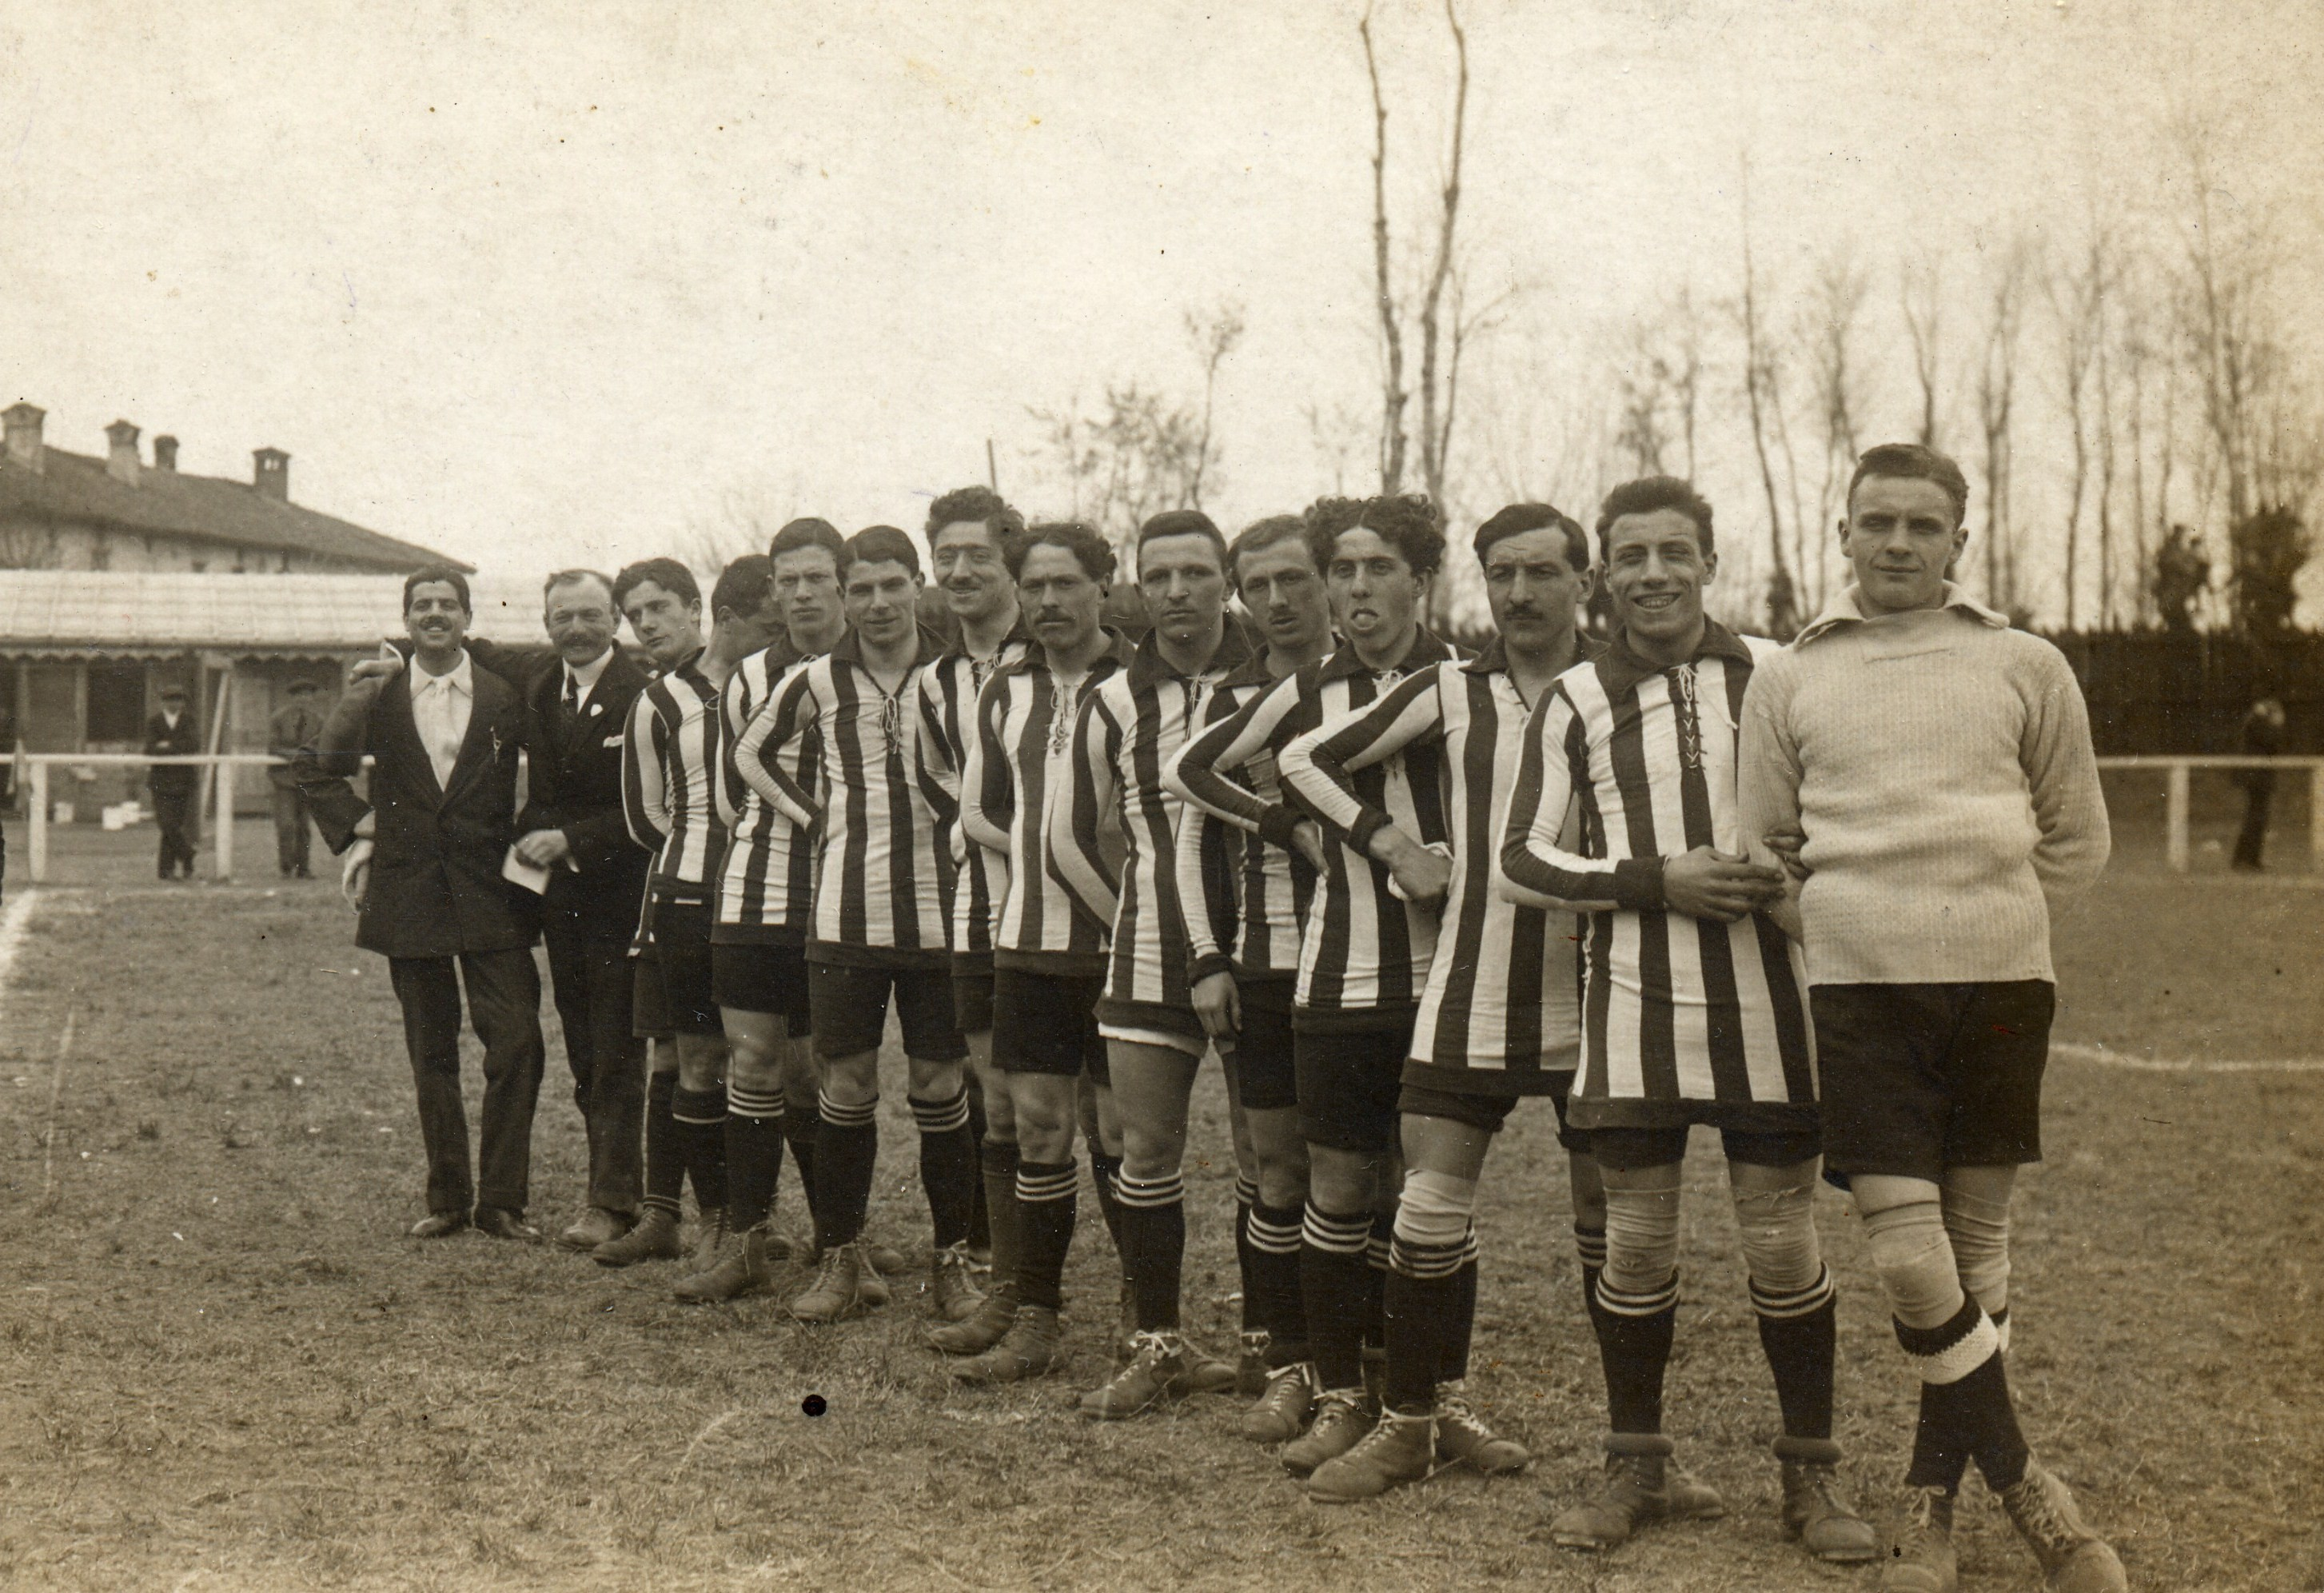 File:Atalanta 1913-14.jpg - Wikipedia